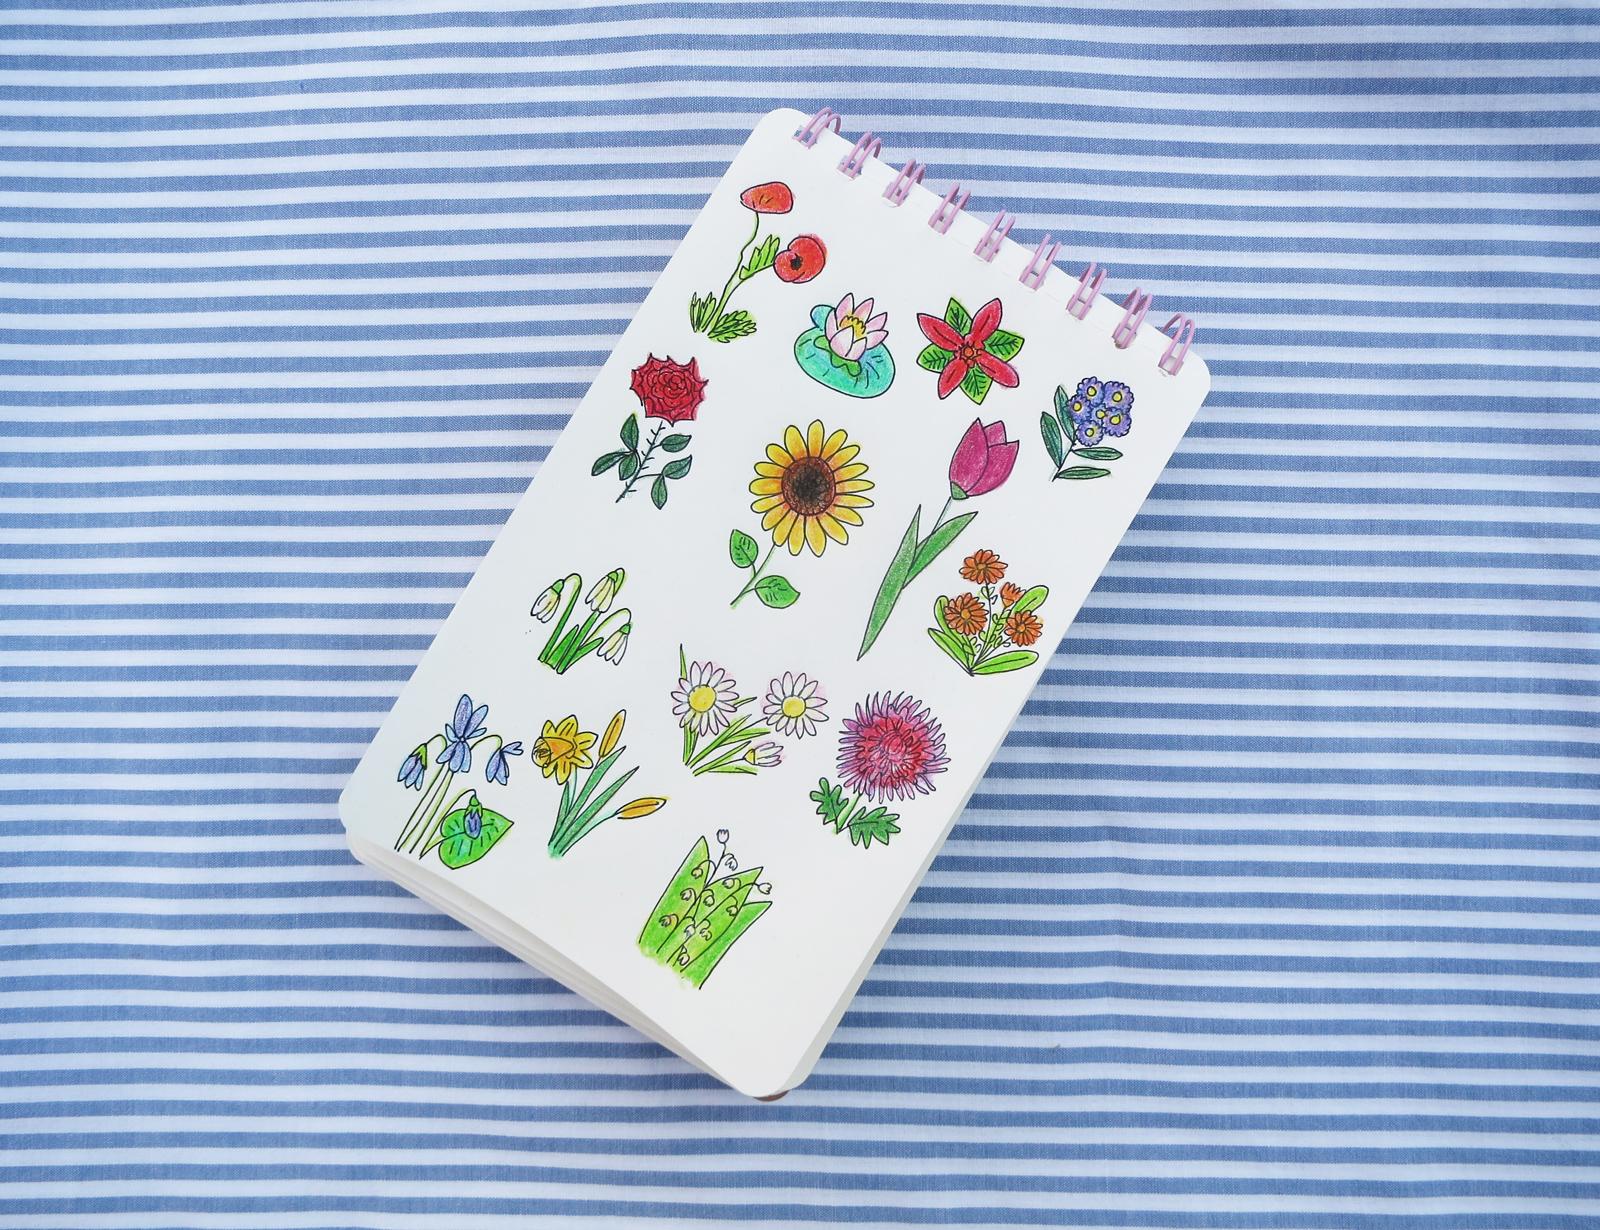 Les fleurs - kwiaty po francusku